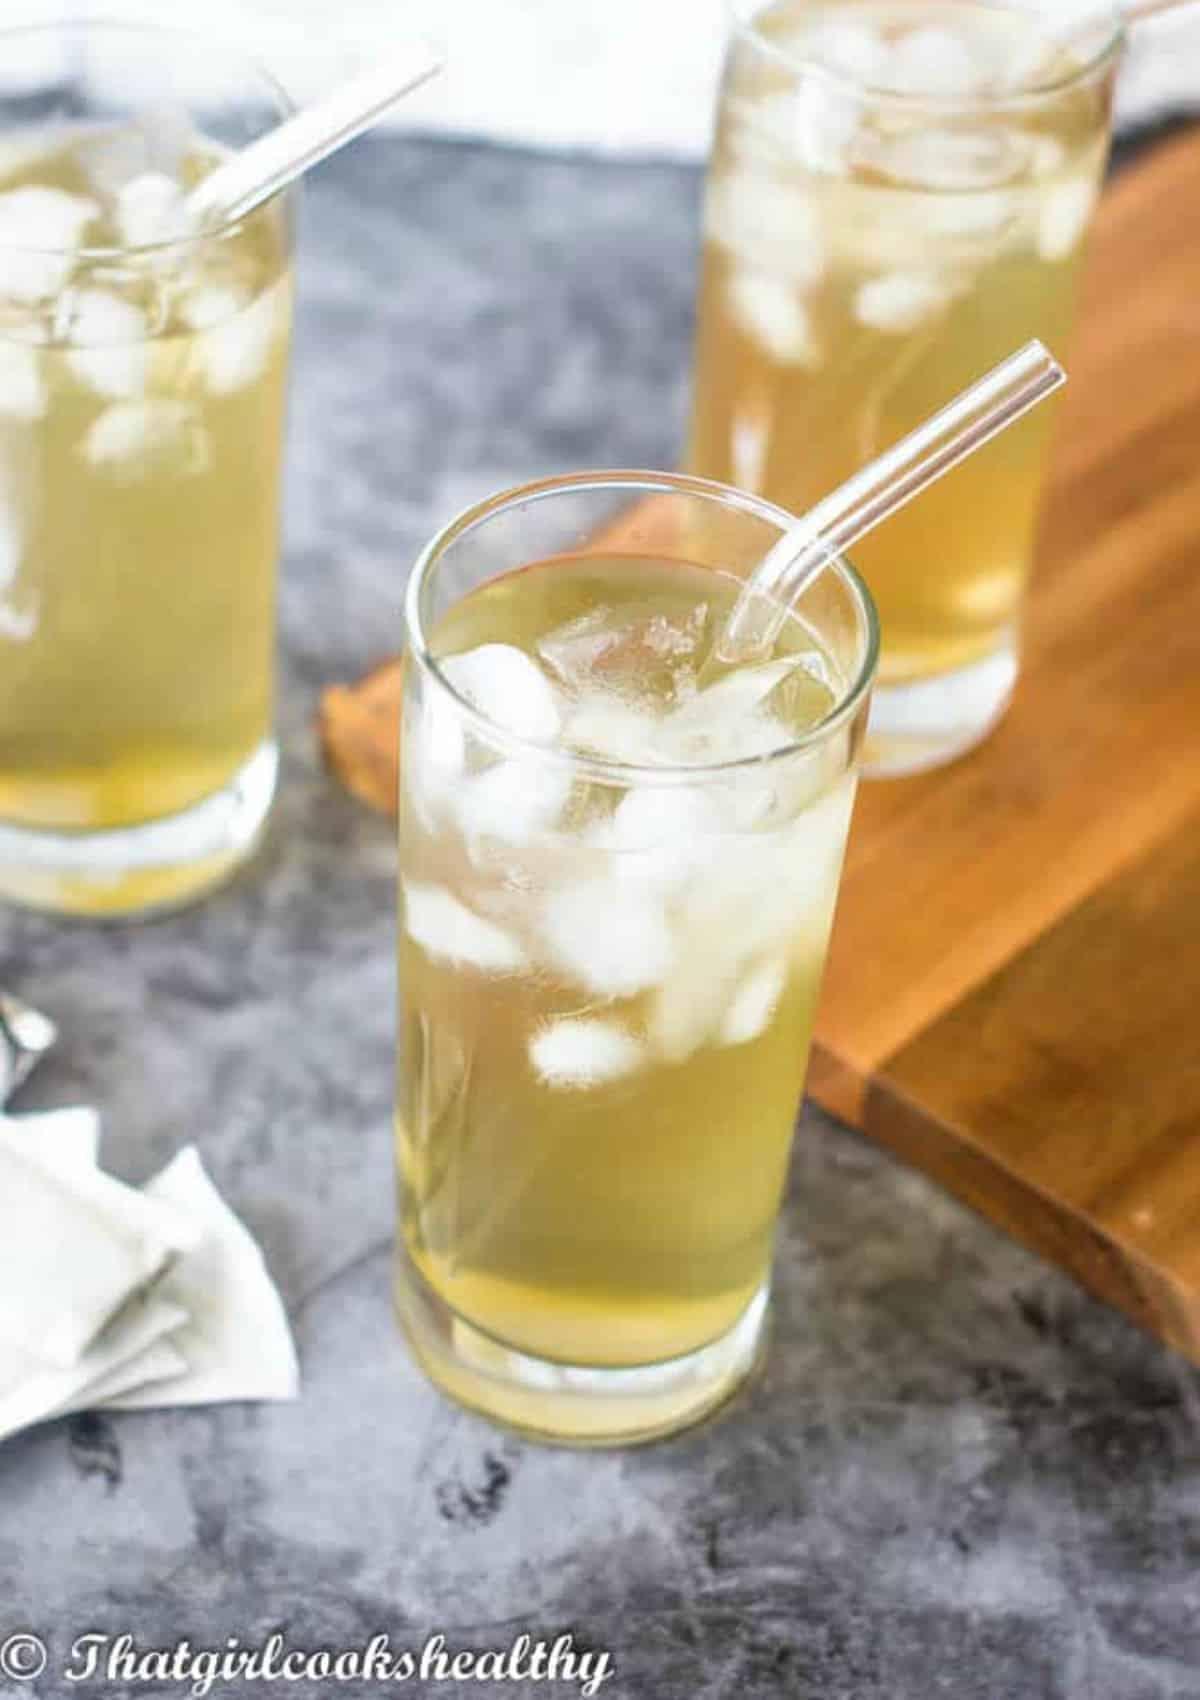 Three glasses of cerasee